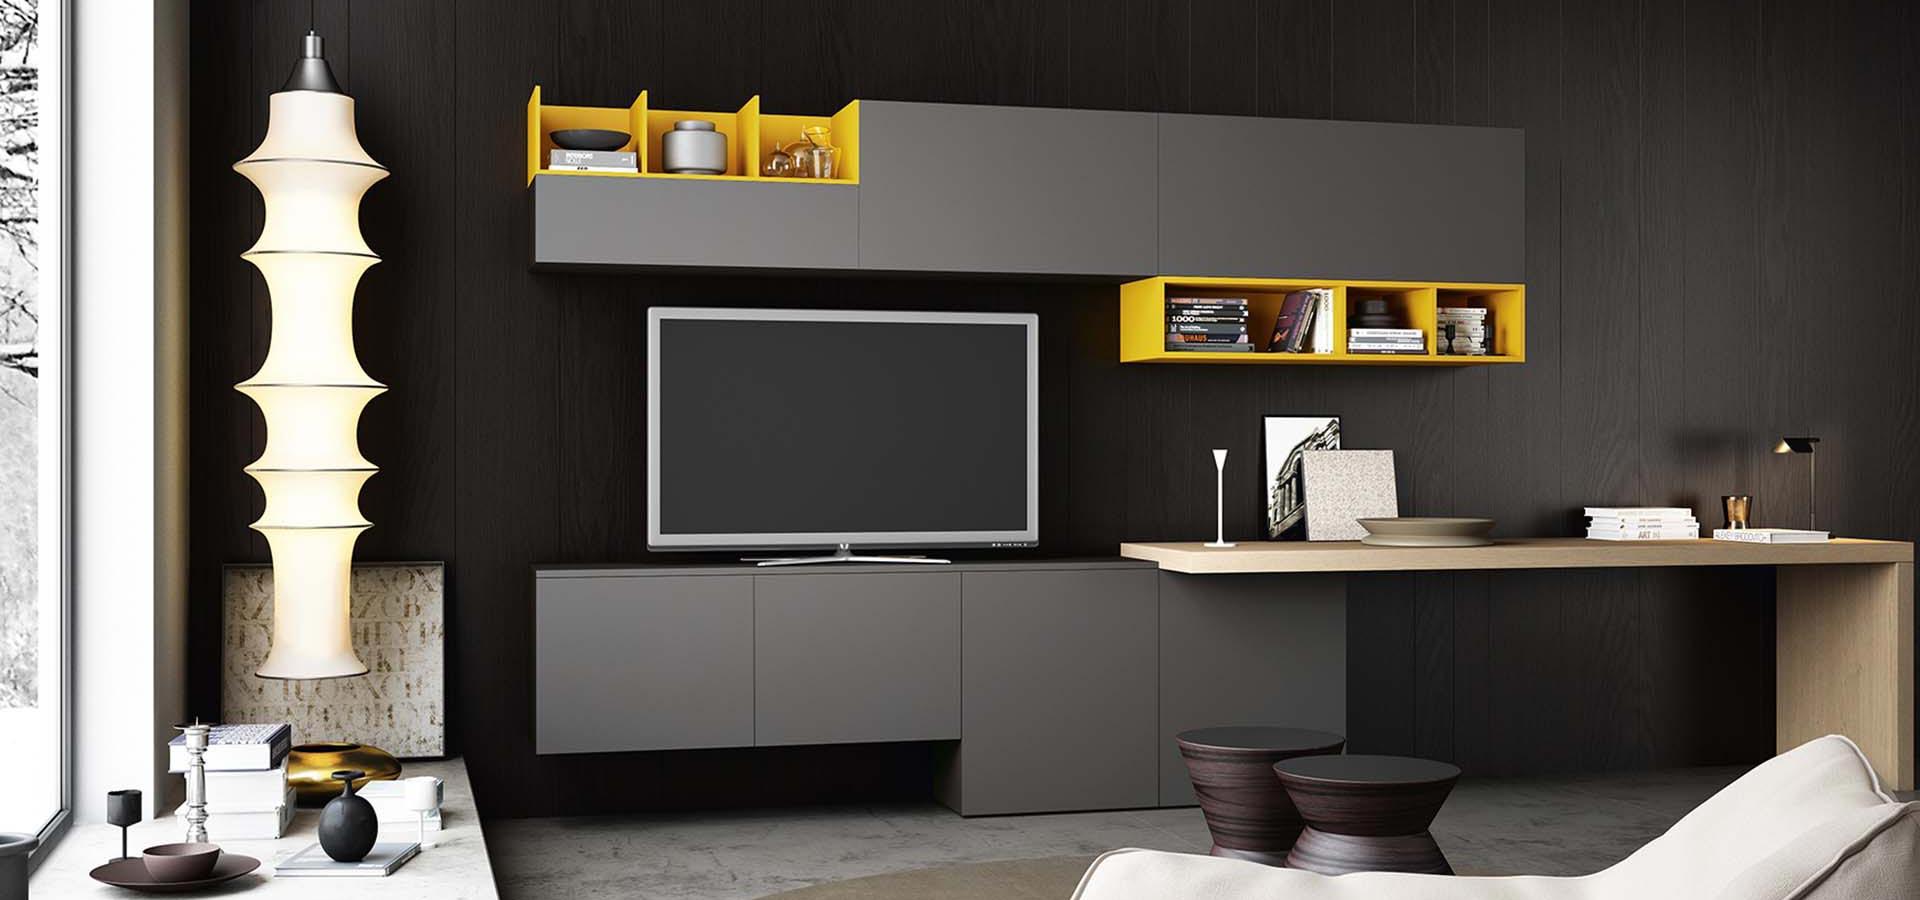 KALI 15 — living room, TV-stand | ARREDO3